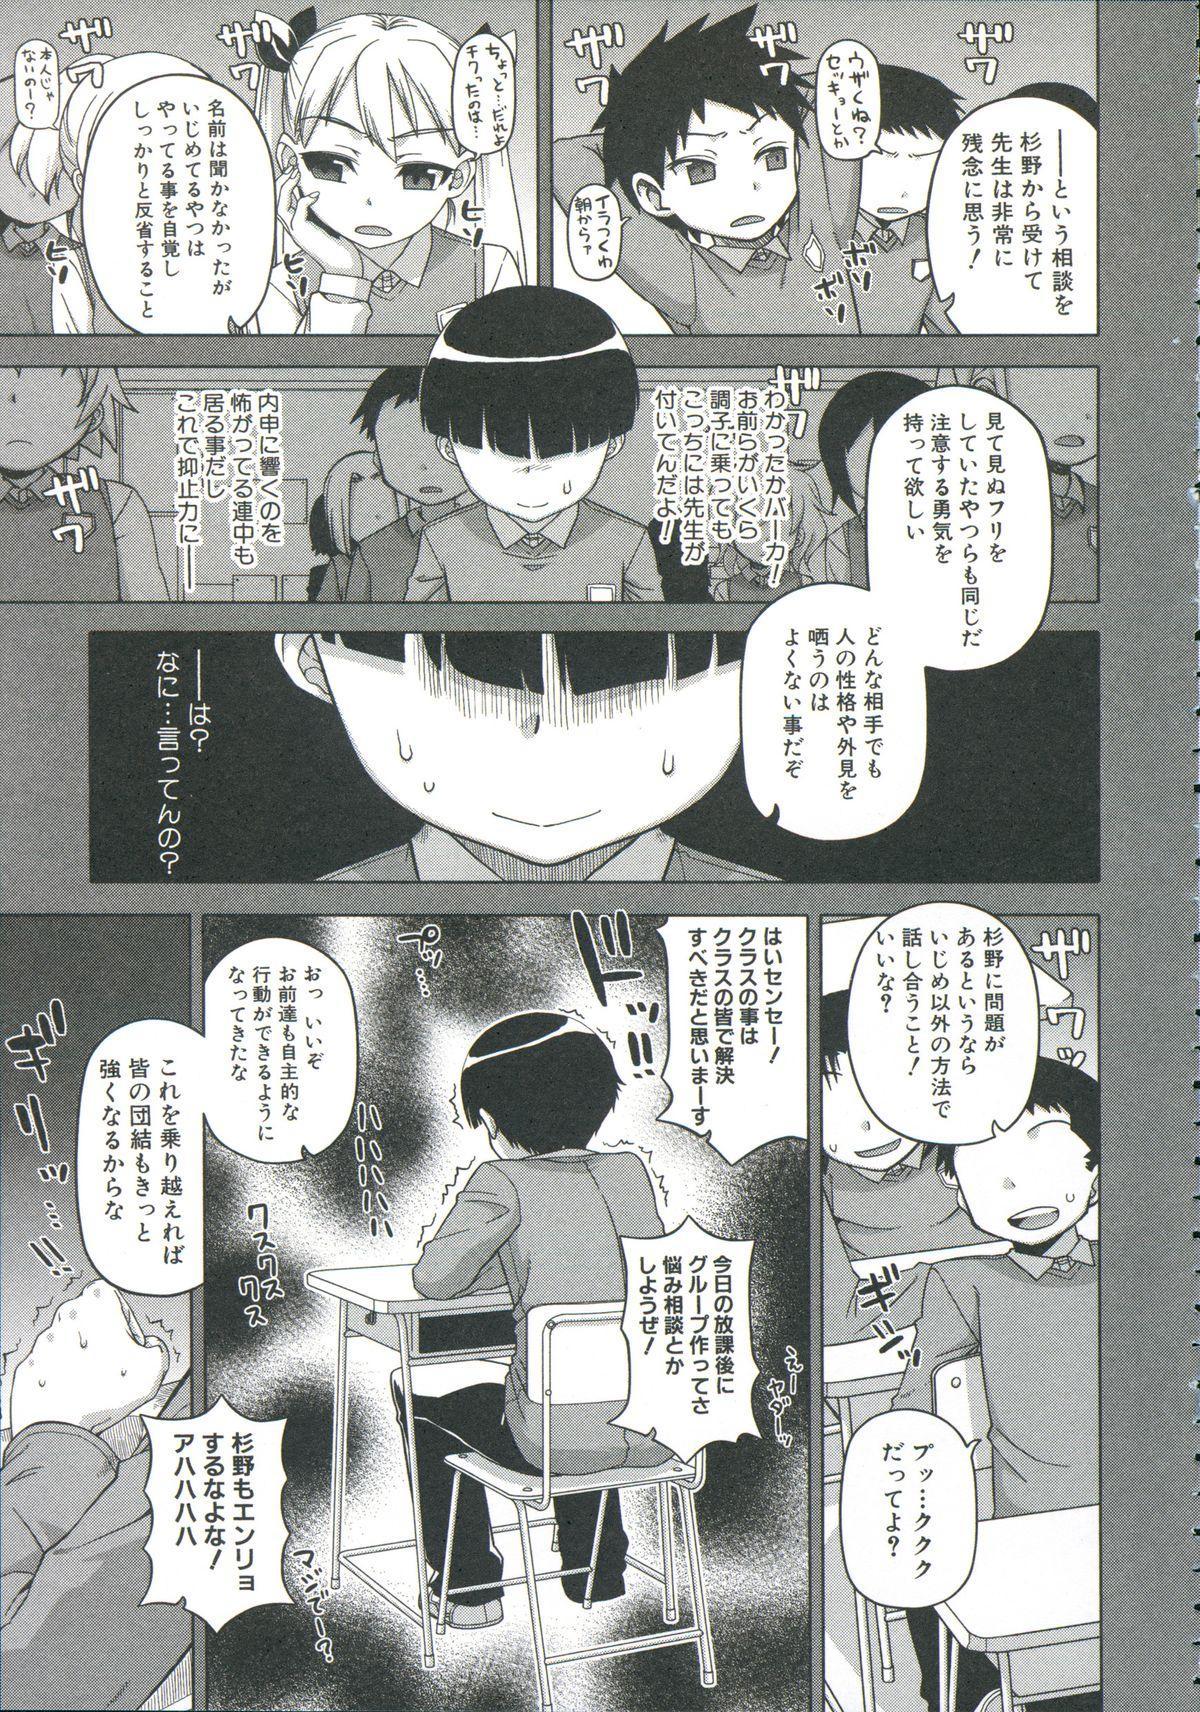 [Takatsu] Ou-sama Appli - King App 45